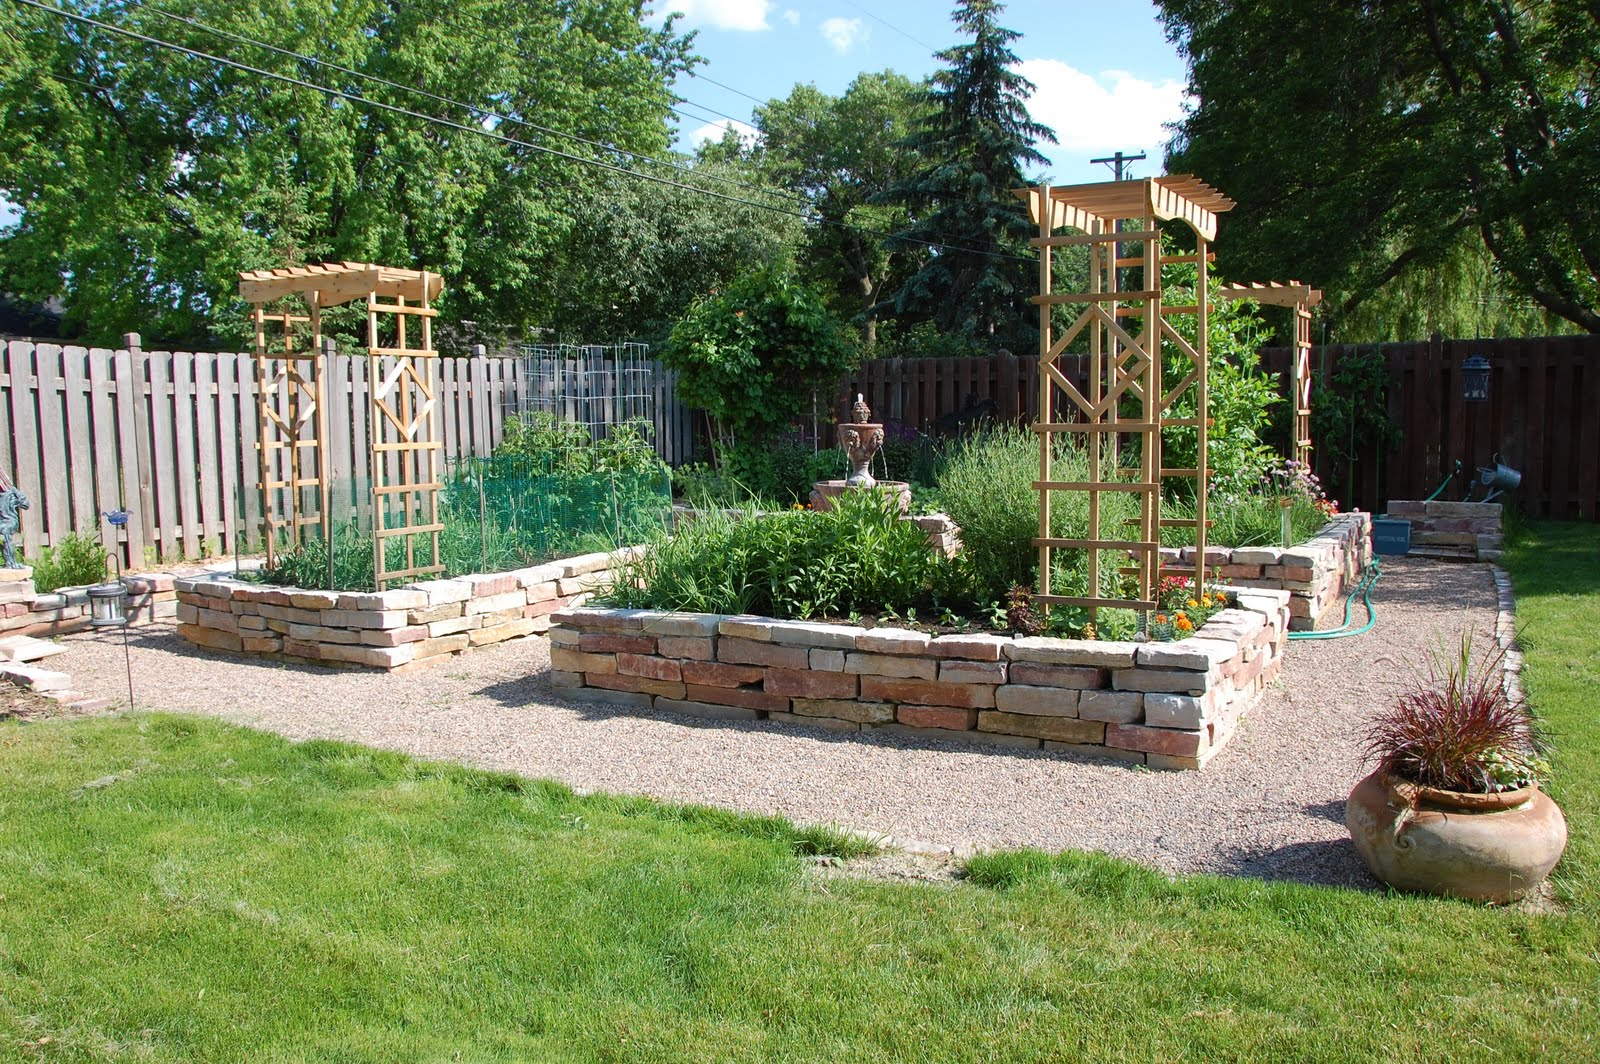 vignette design: Design Bucket List #3: Design a Beautiful ... on Backyard Raised Garden Bed Ideas id=27568